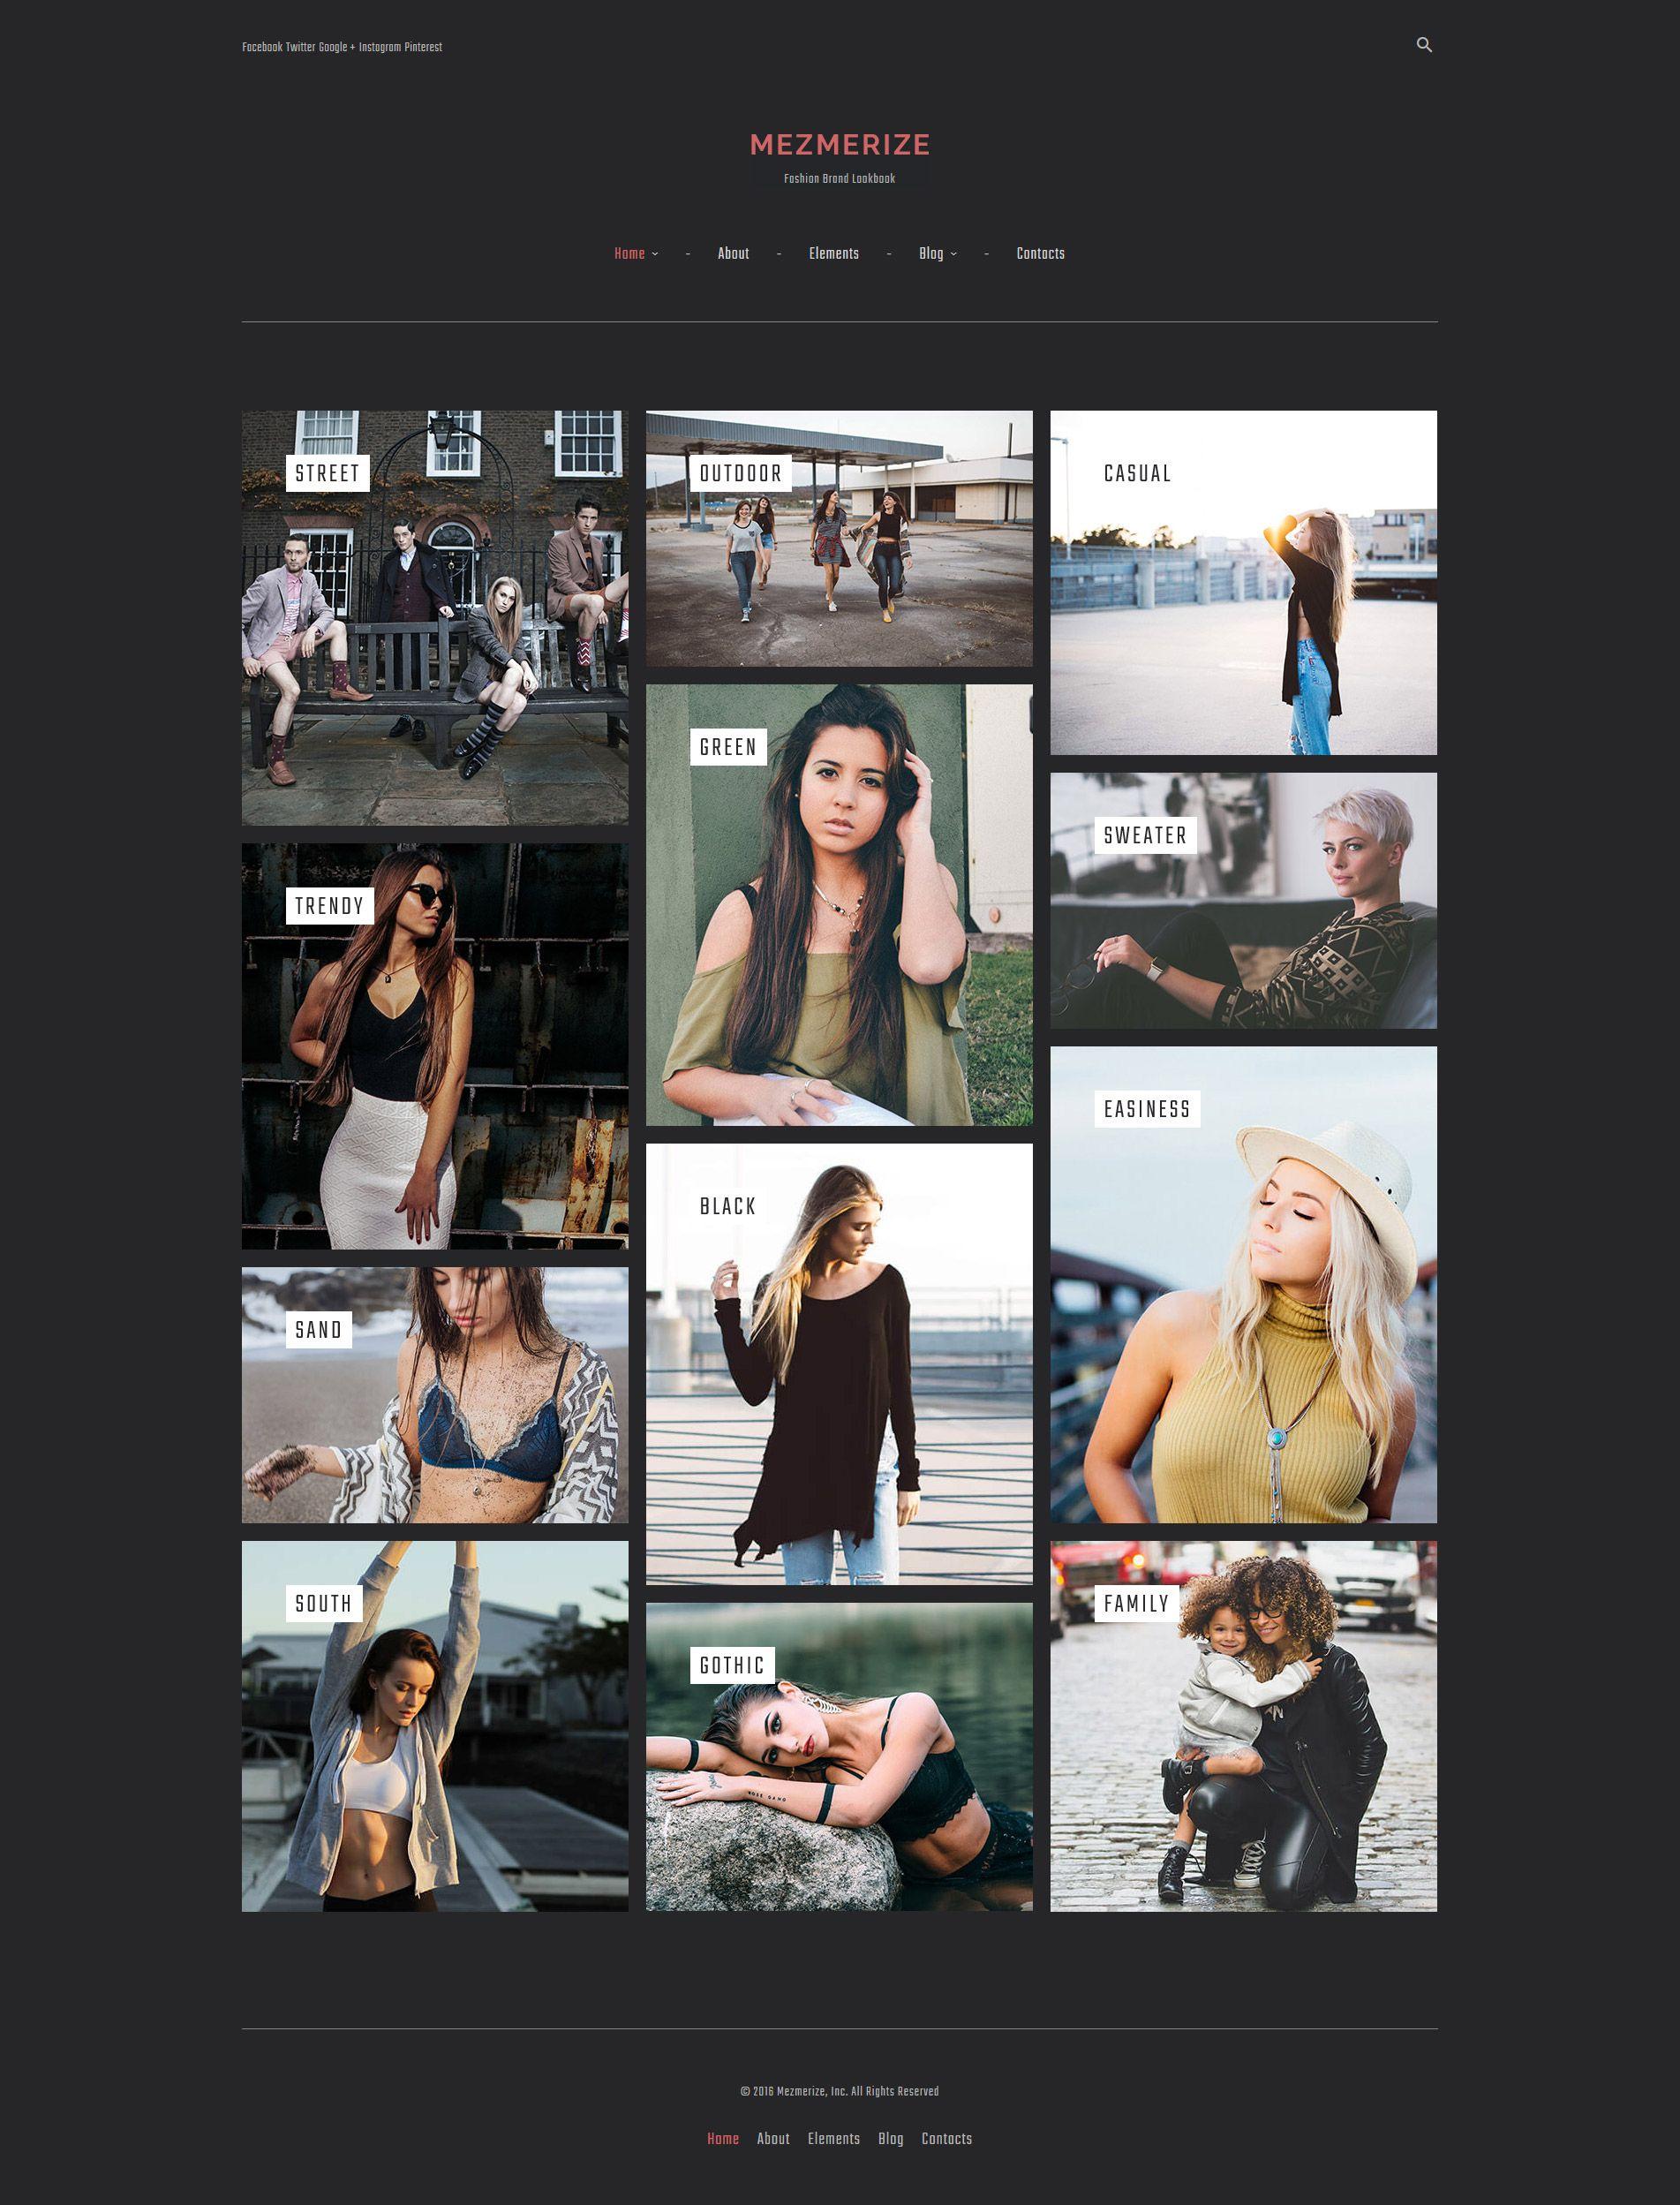 Mezmerize - Fashion Brand Lookbook WordPress Theme | Ideas